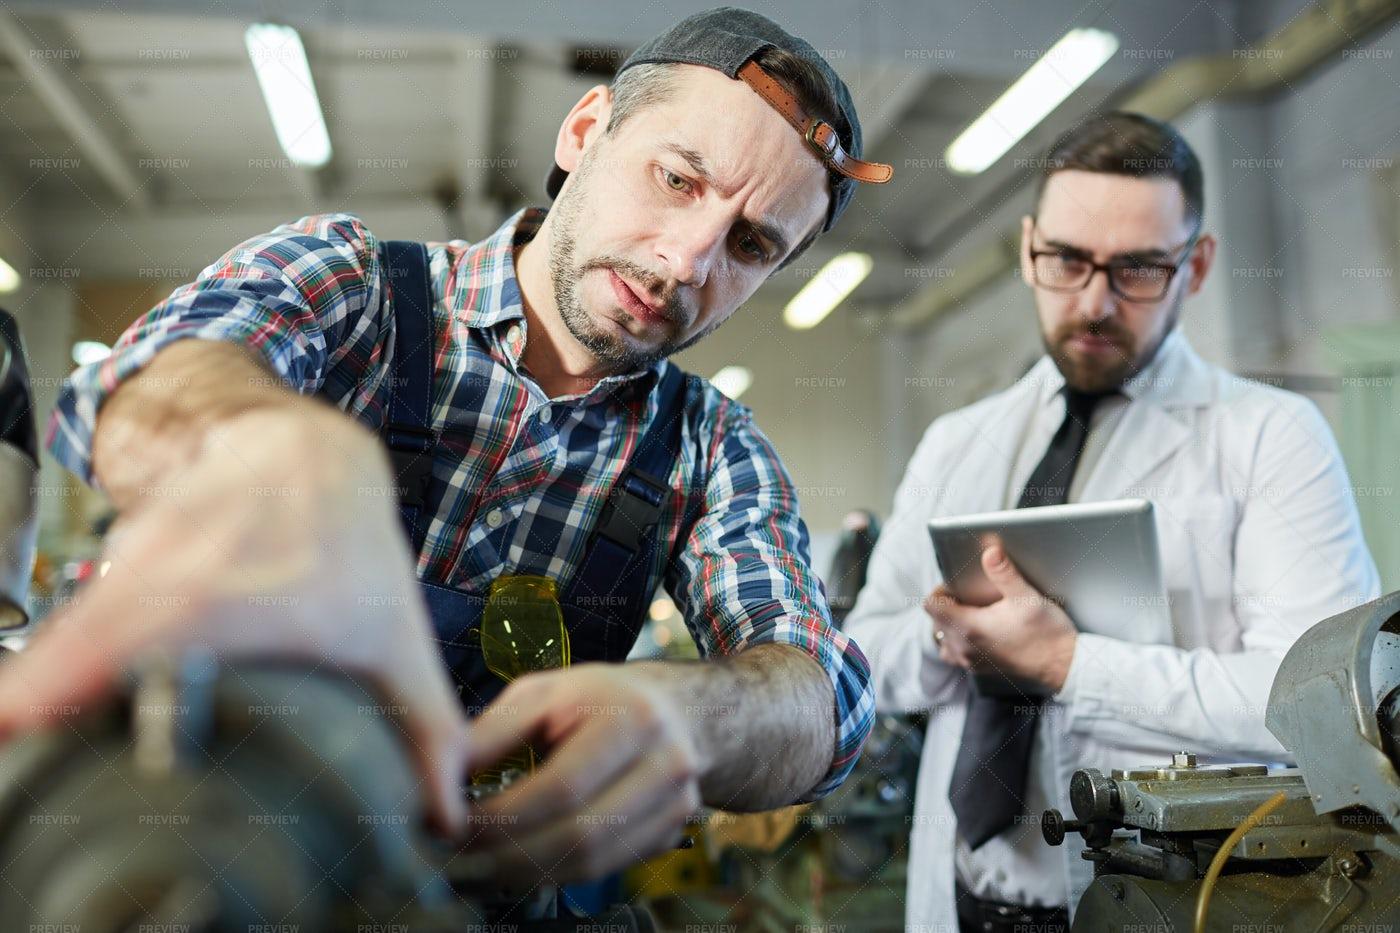 Repairman Fixing Machines At...: Stock Photos